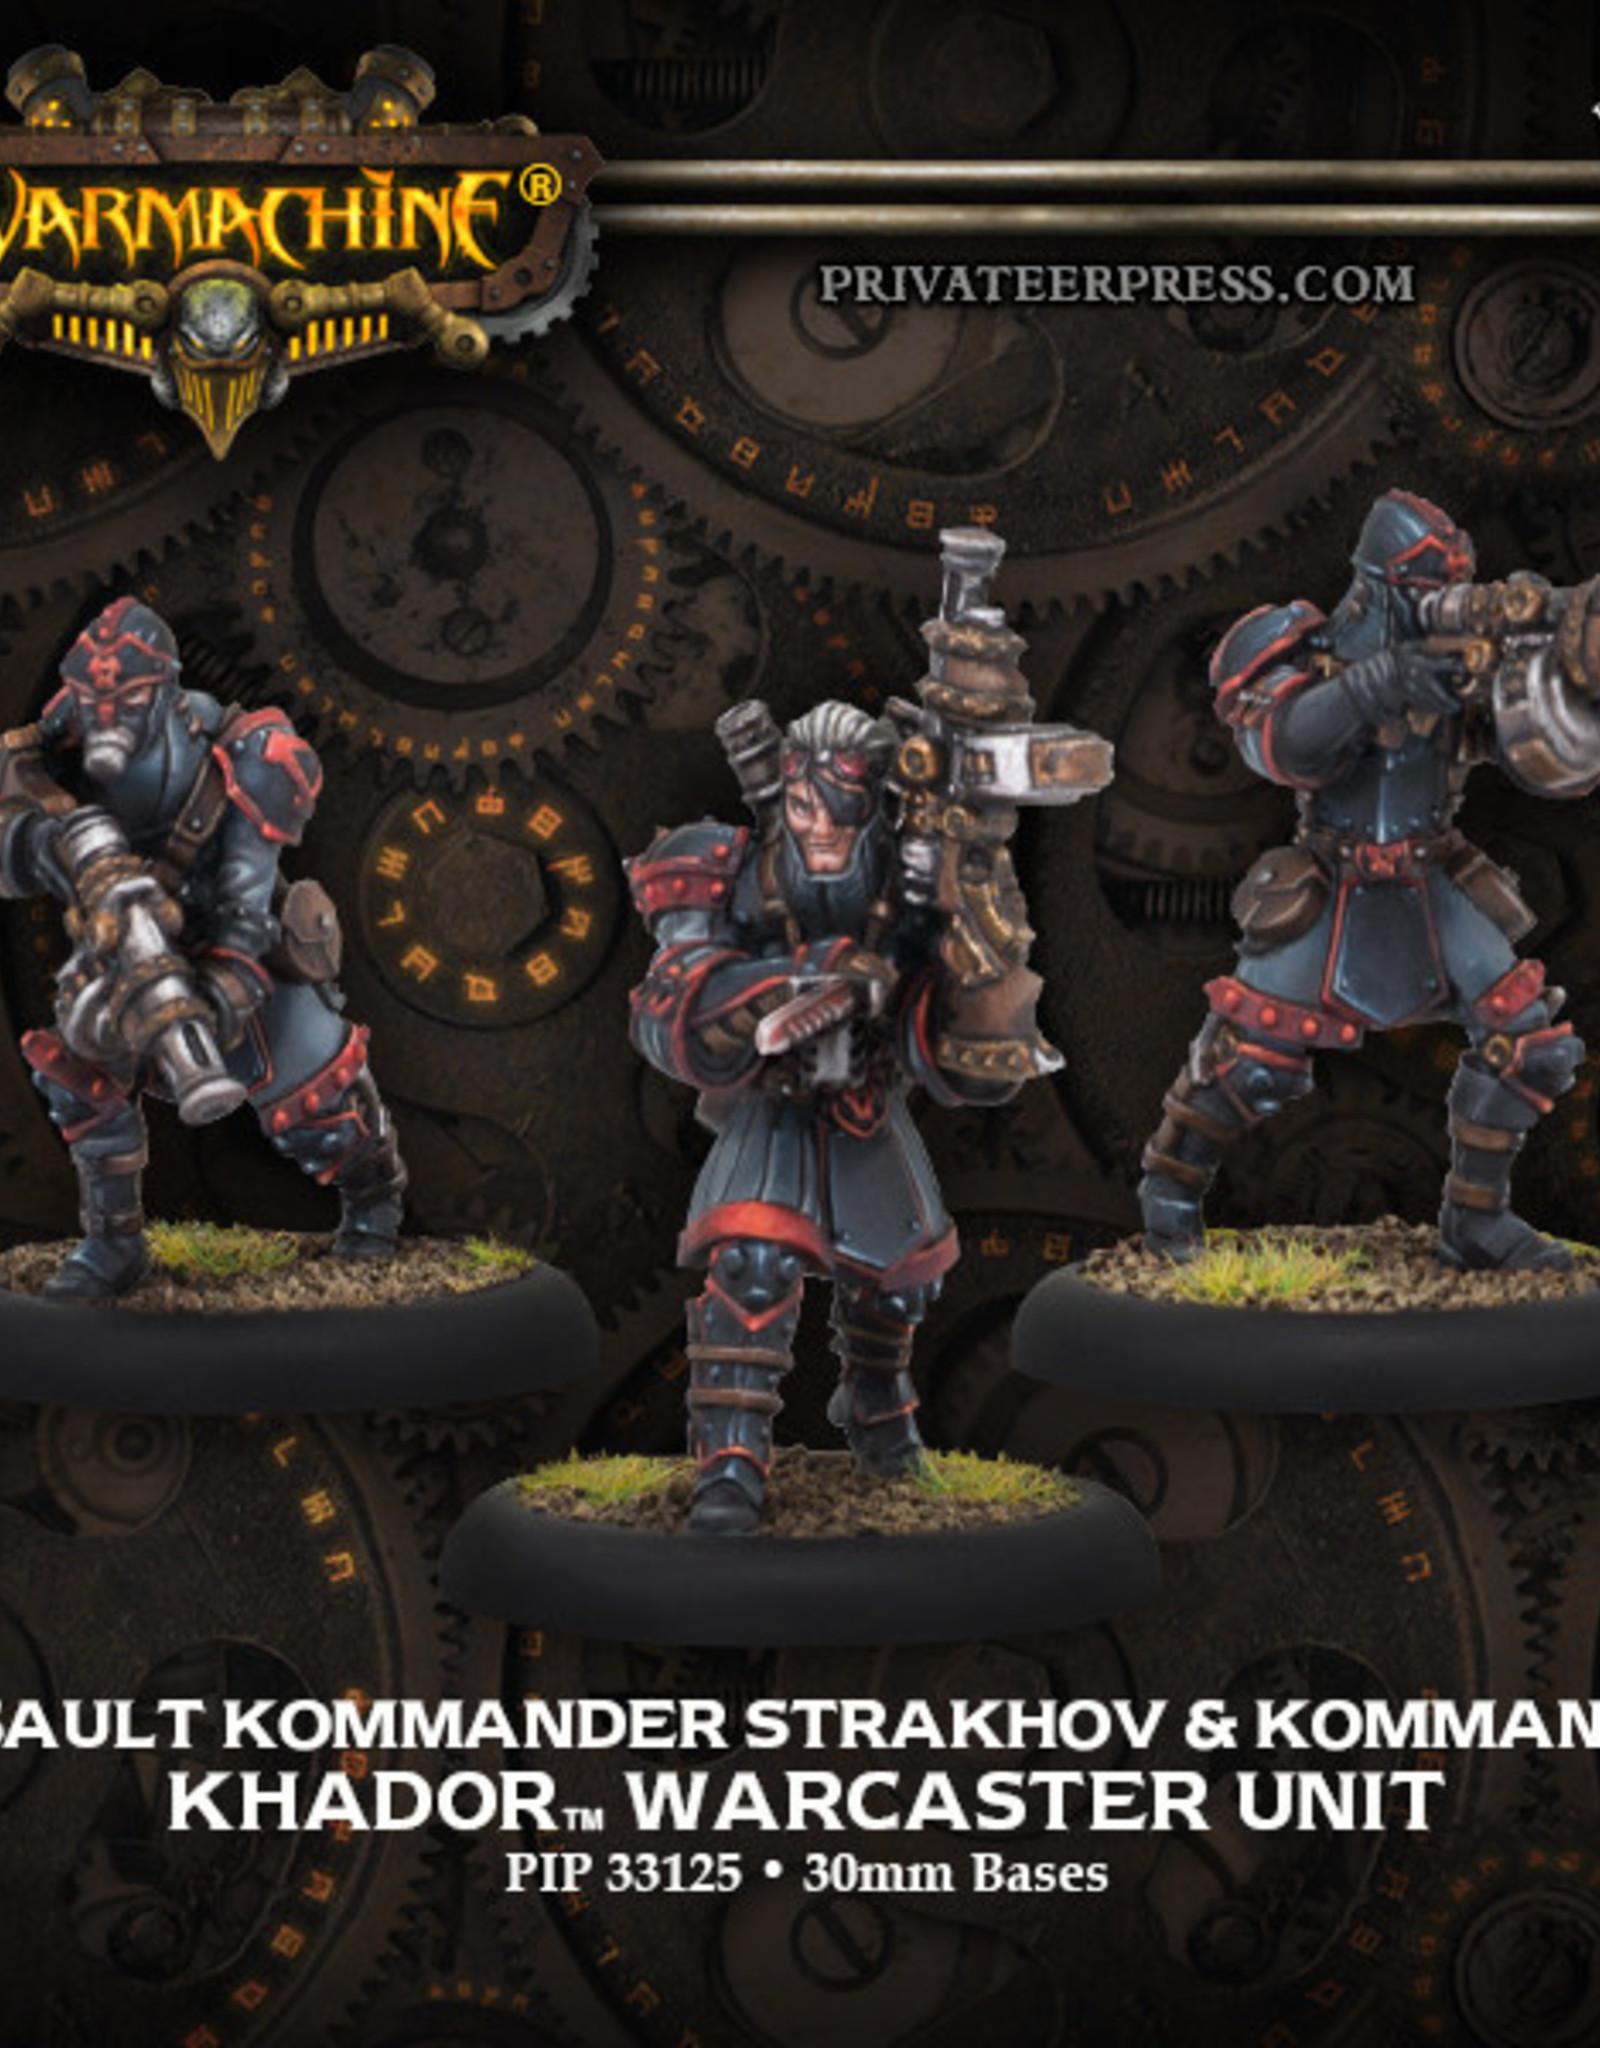 Warmachine Khador Kommander  Strakhov/Kommandos